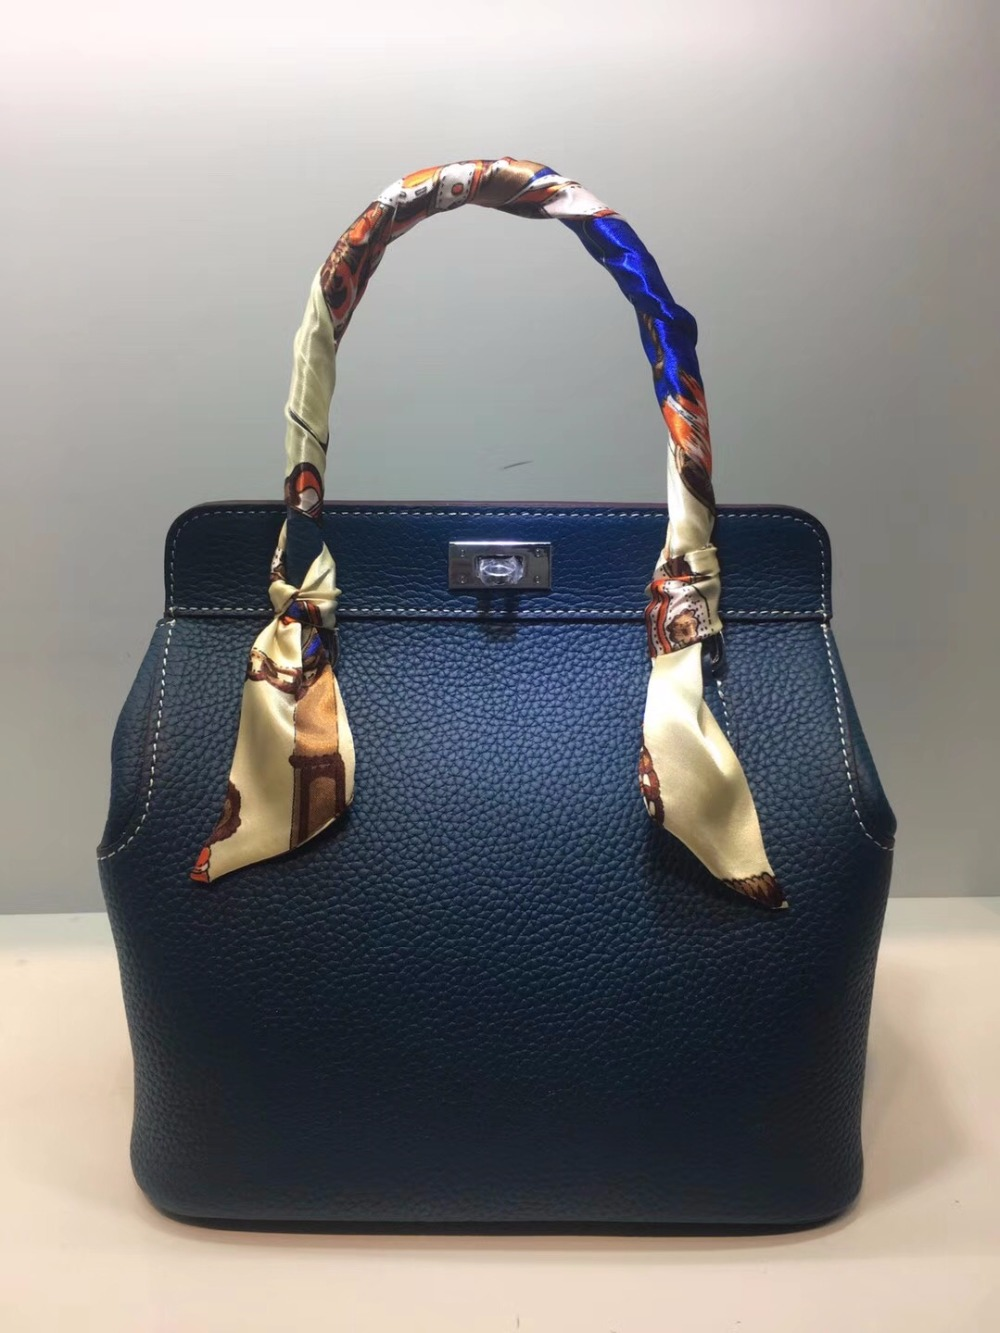 2018 Women Genuine Leather Designer Brand Lock Bucket Hasp Luxury Handbags Crossbody Purse Messenger Shoulder Tote Bags